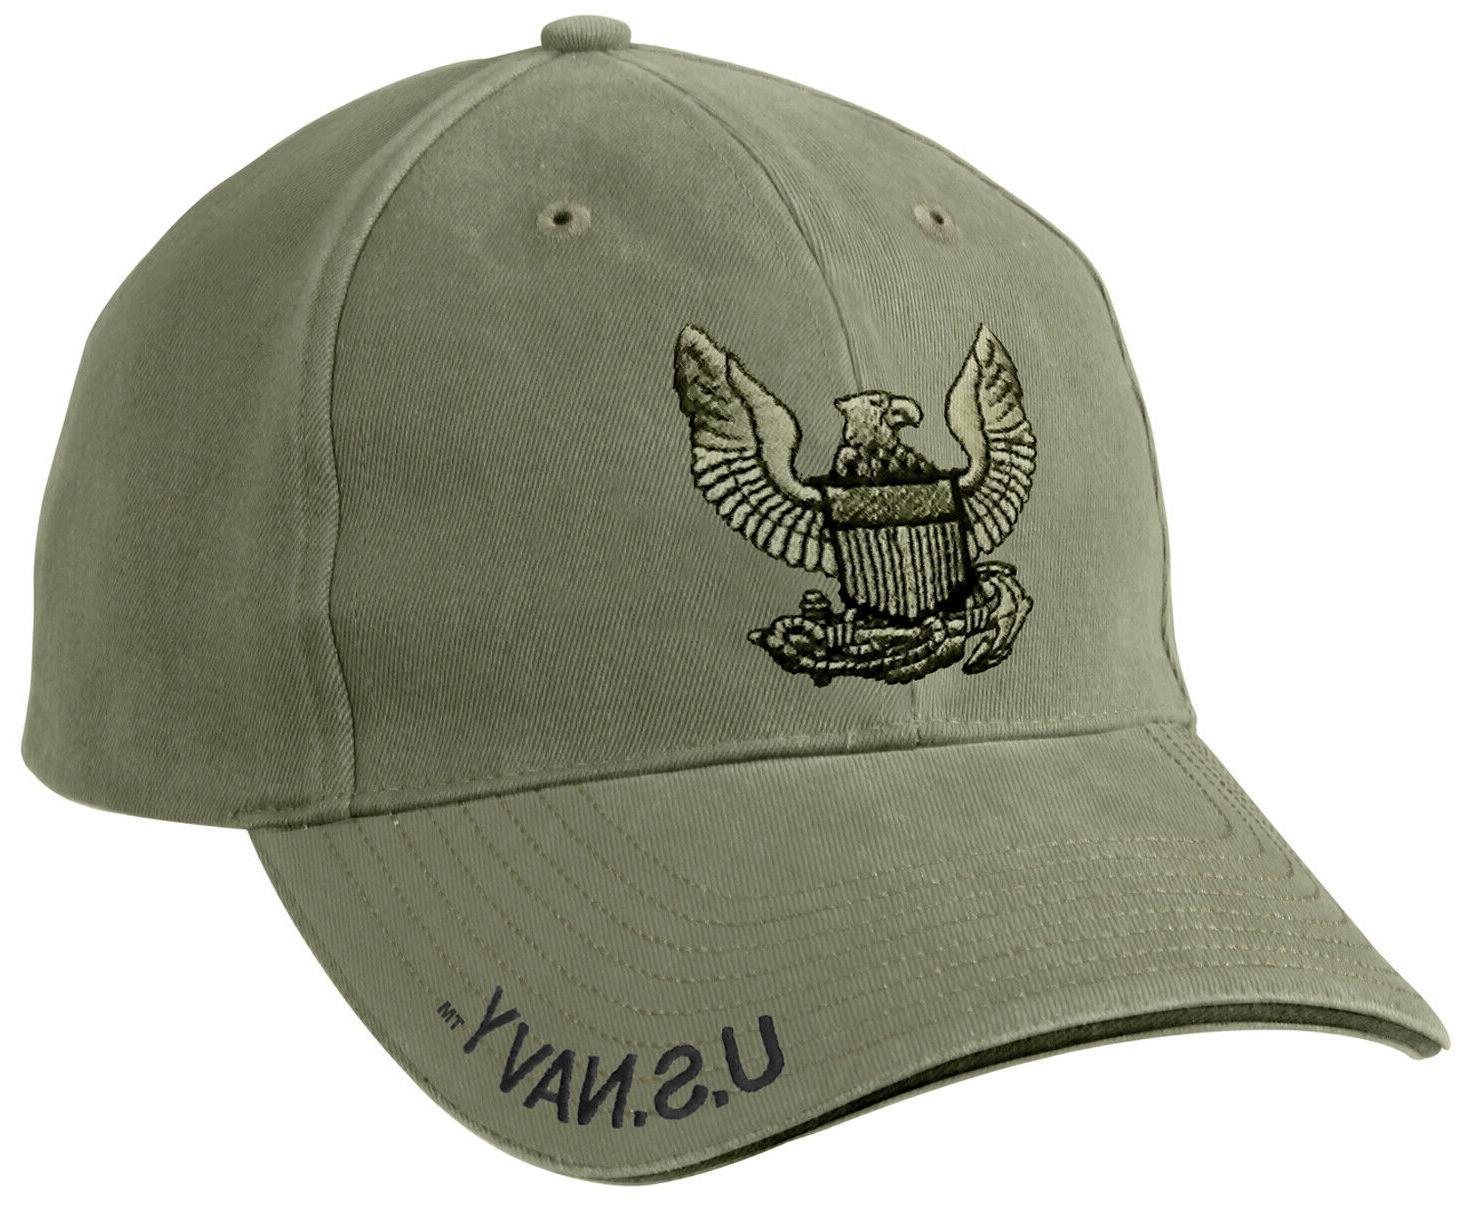 USA Navy Eagle Logo Low Profile Hat - Rothco OD Adjustable M